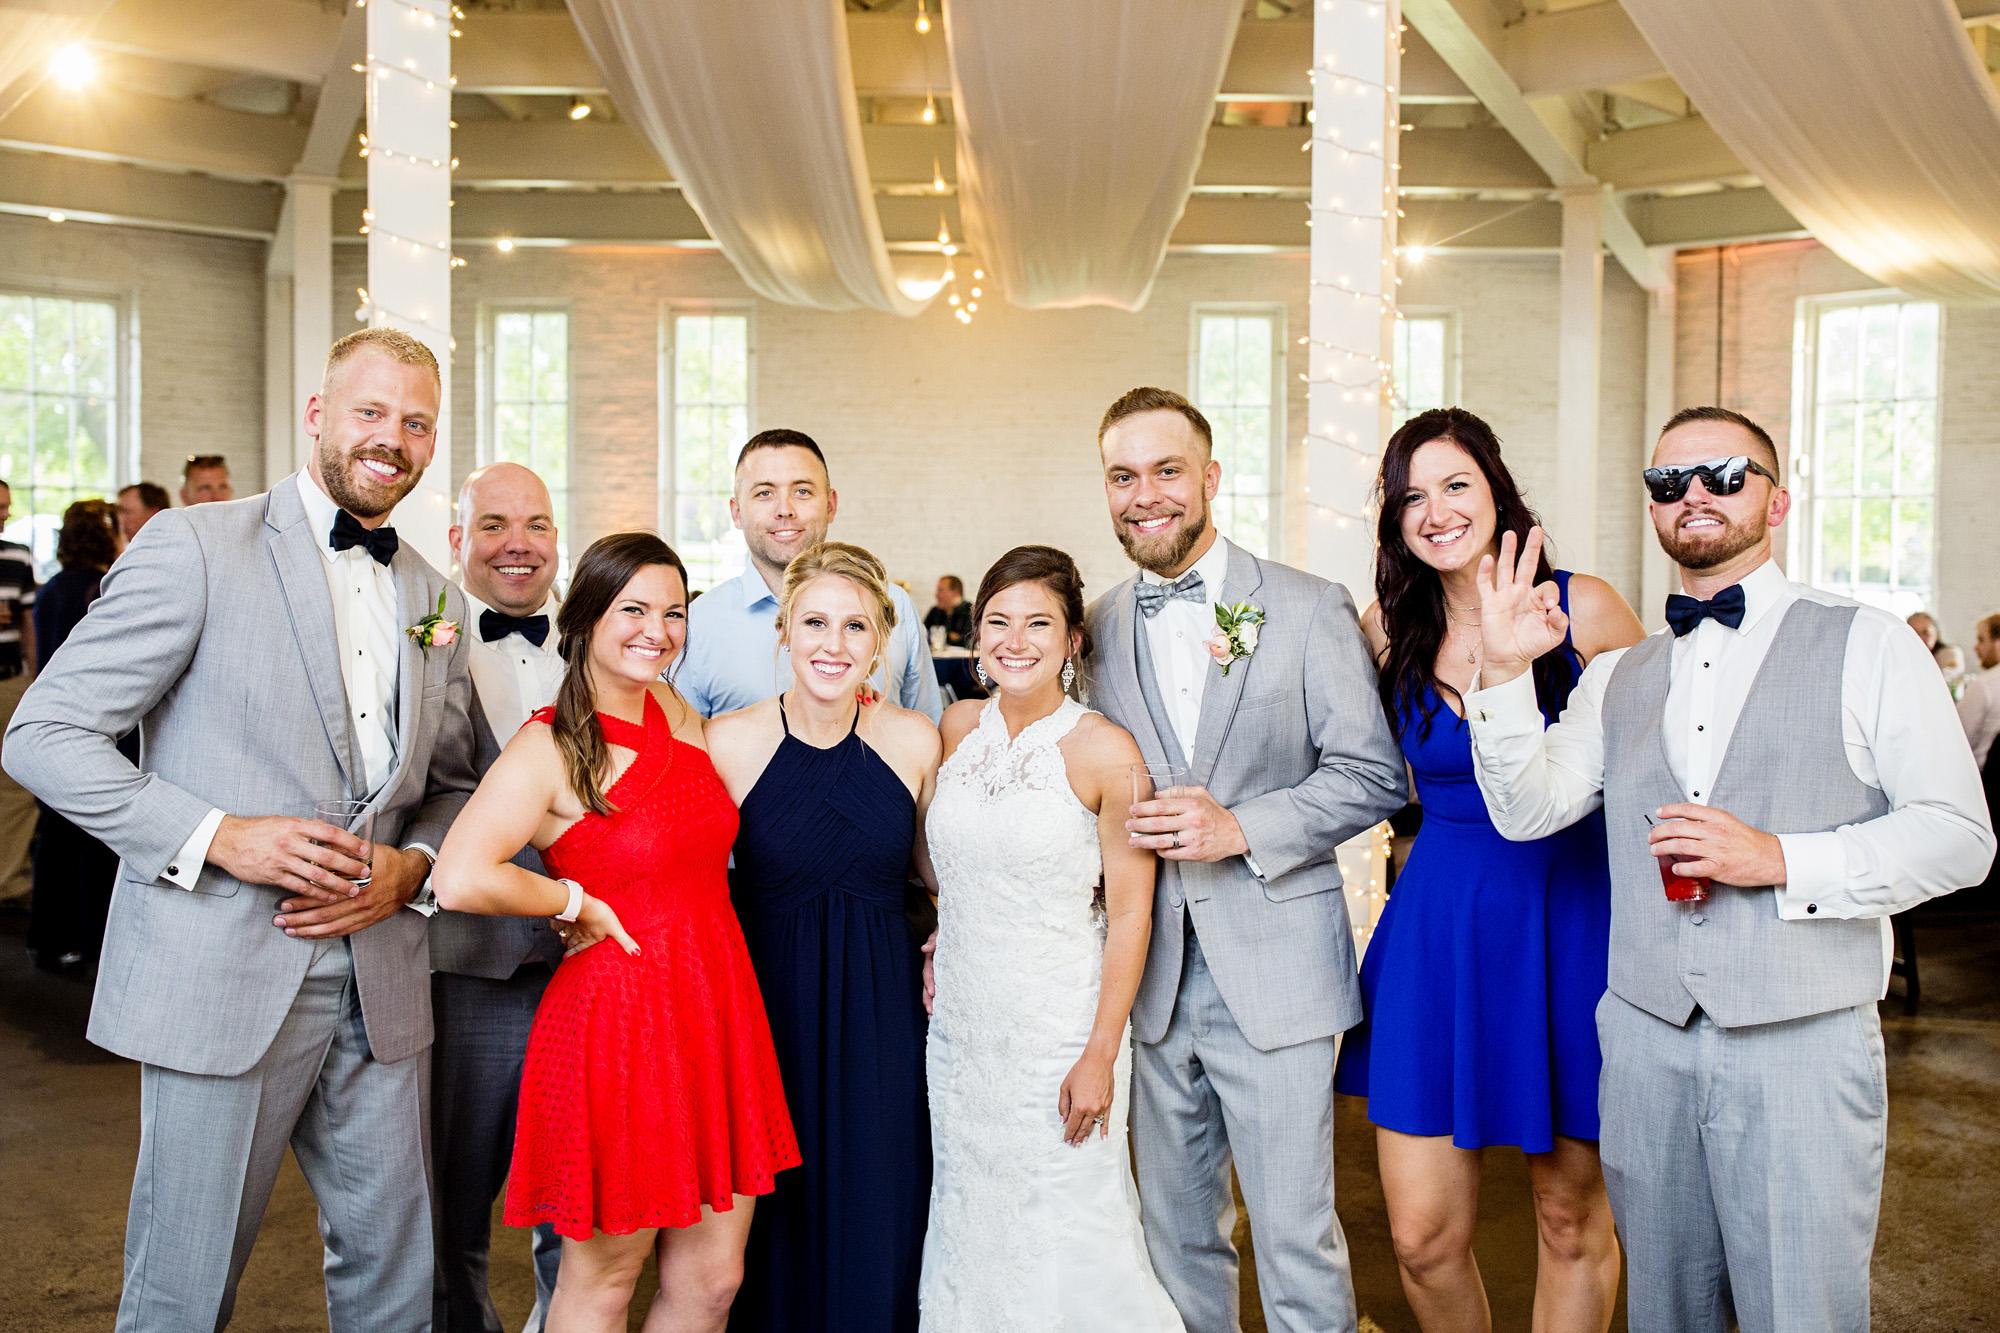 Seriously_Sabrina_Photography_Lexington_Kentucky_Round_Barn_Red_Mile_Stable_of_Memories_Wedding_Hart_106.jpg